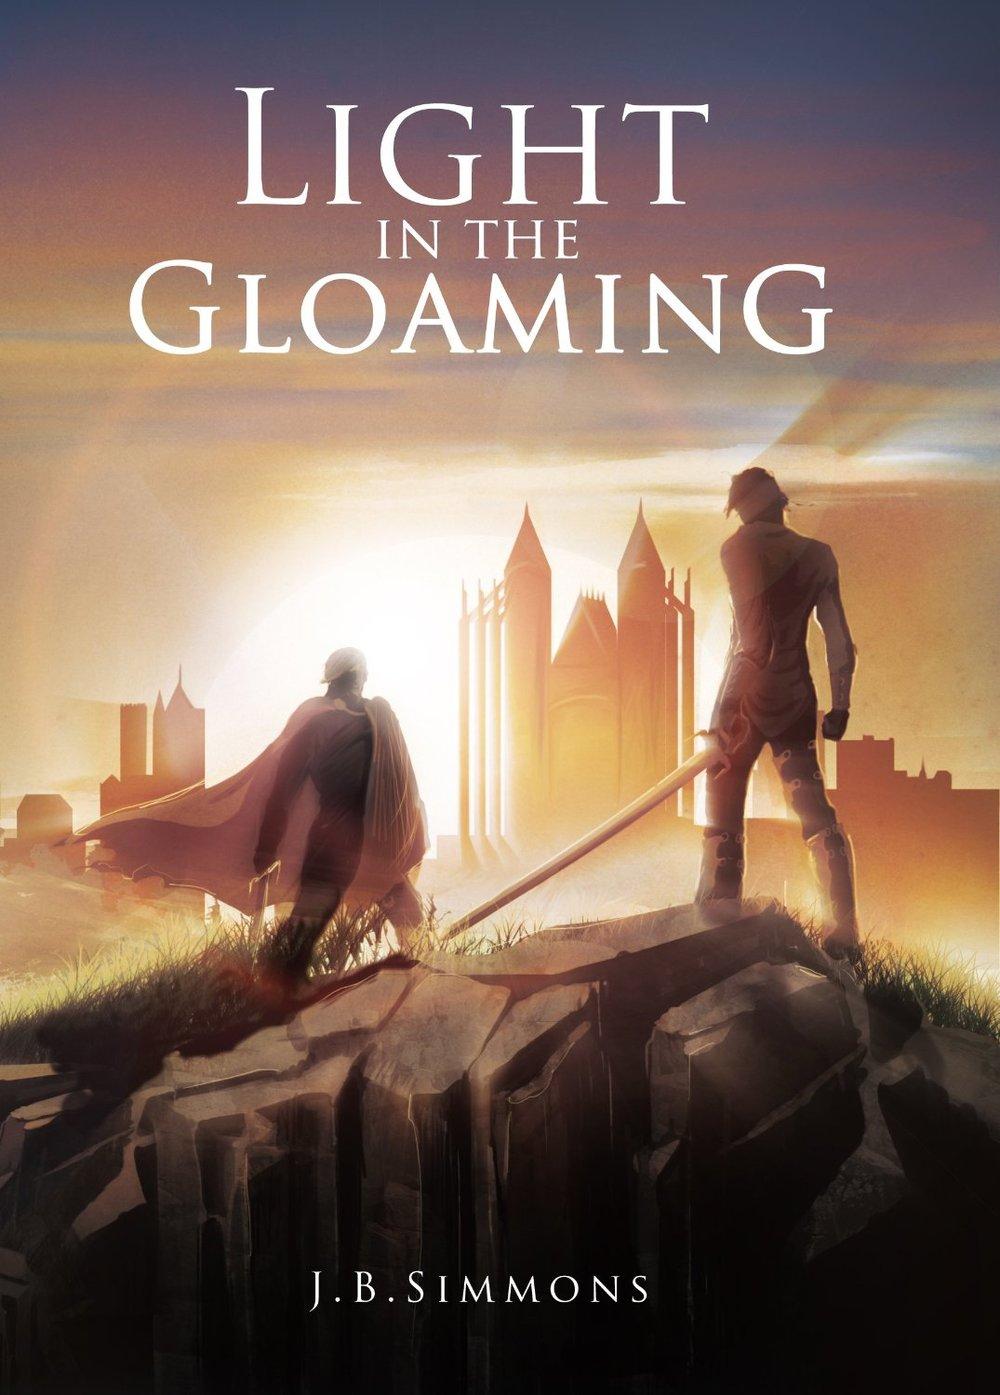 https://www.amazon.com/Light-Gloaming-J-B-Simmons-ebook/dp/B00E1W6E1C/